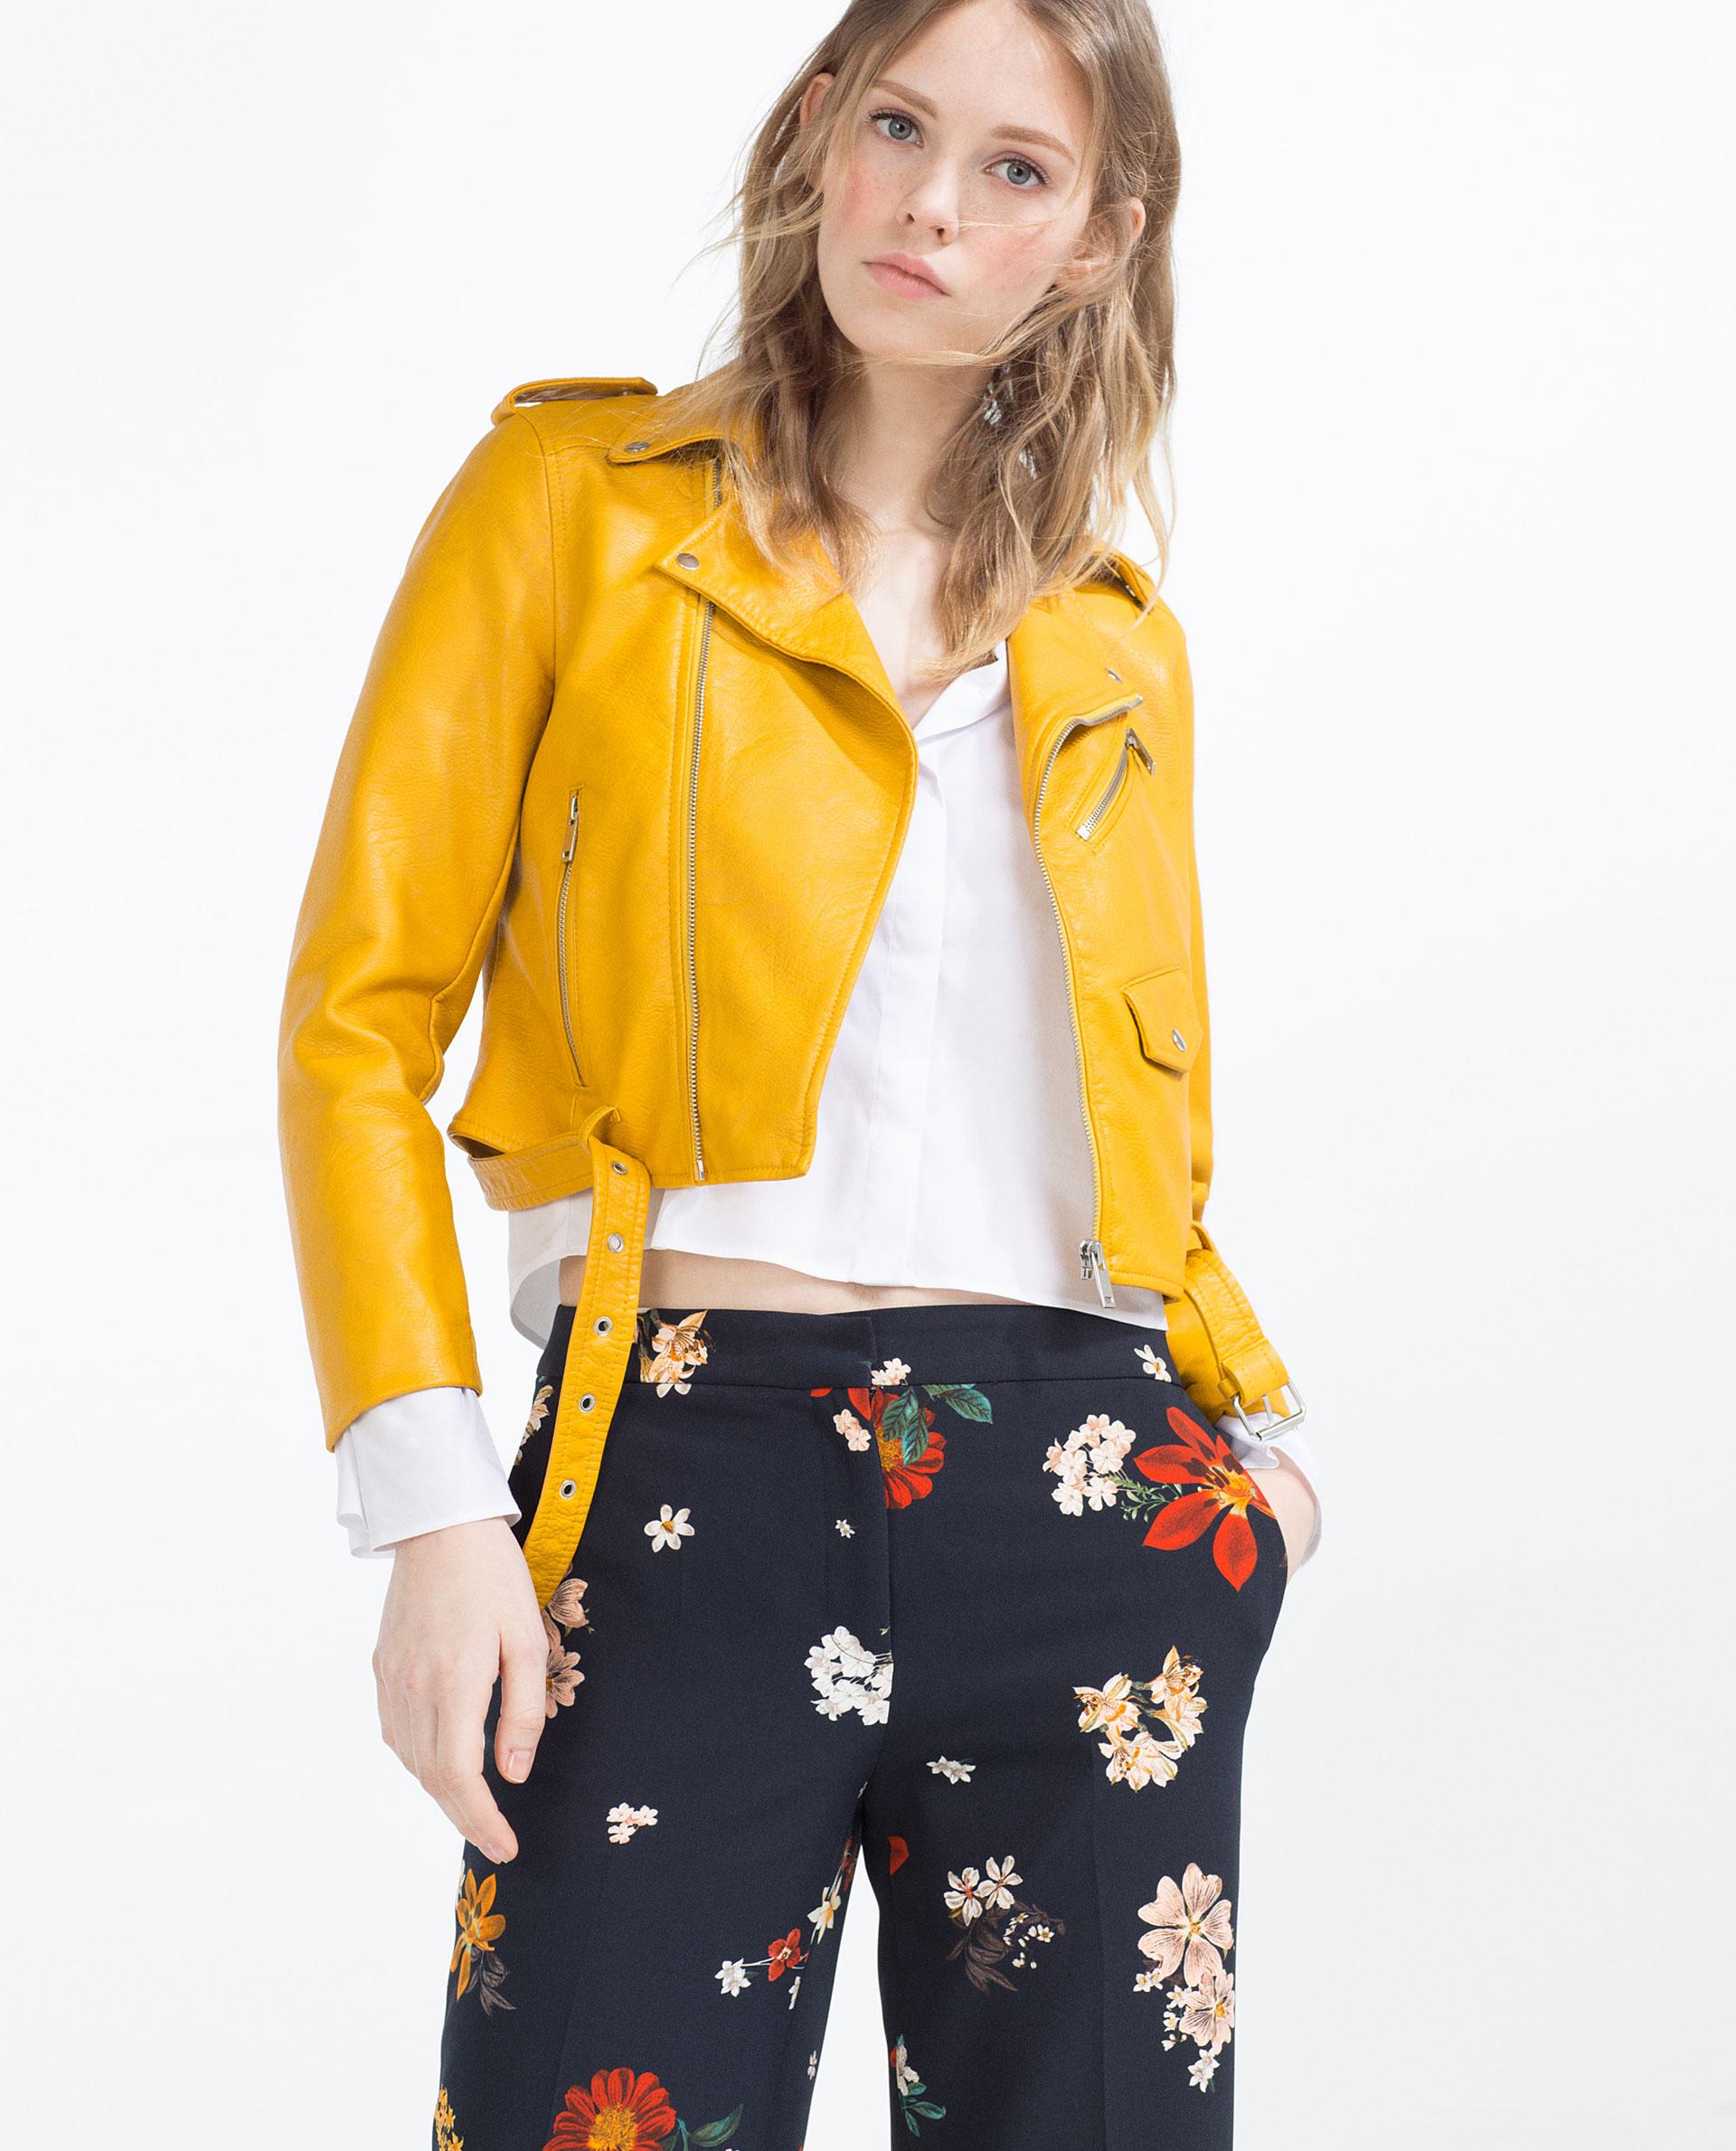 3-Angela-Simmonss-Instagram-Zara-Yellow-Faux-Leather-Jacket-.jpg